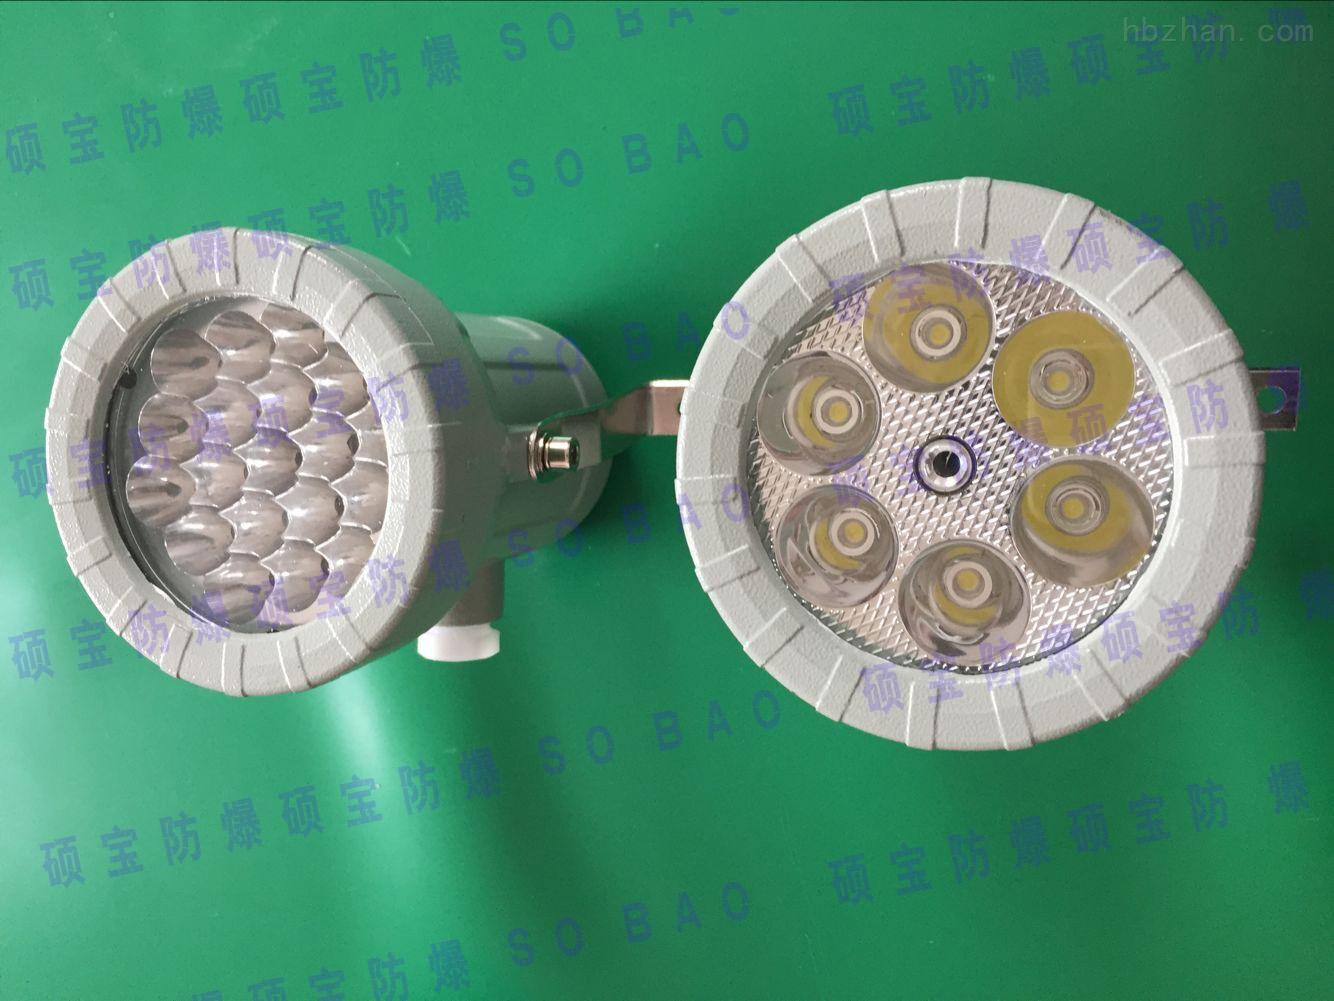 防爆LED视孔灯使用说明书